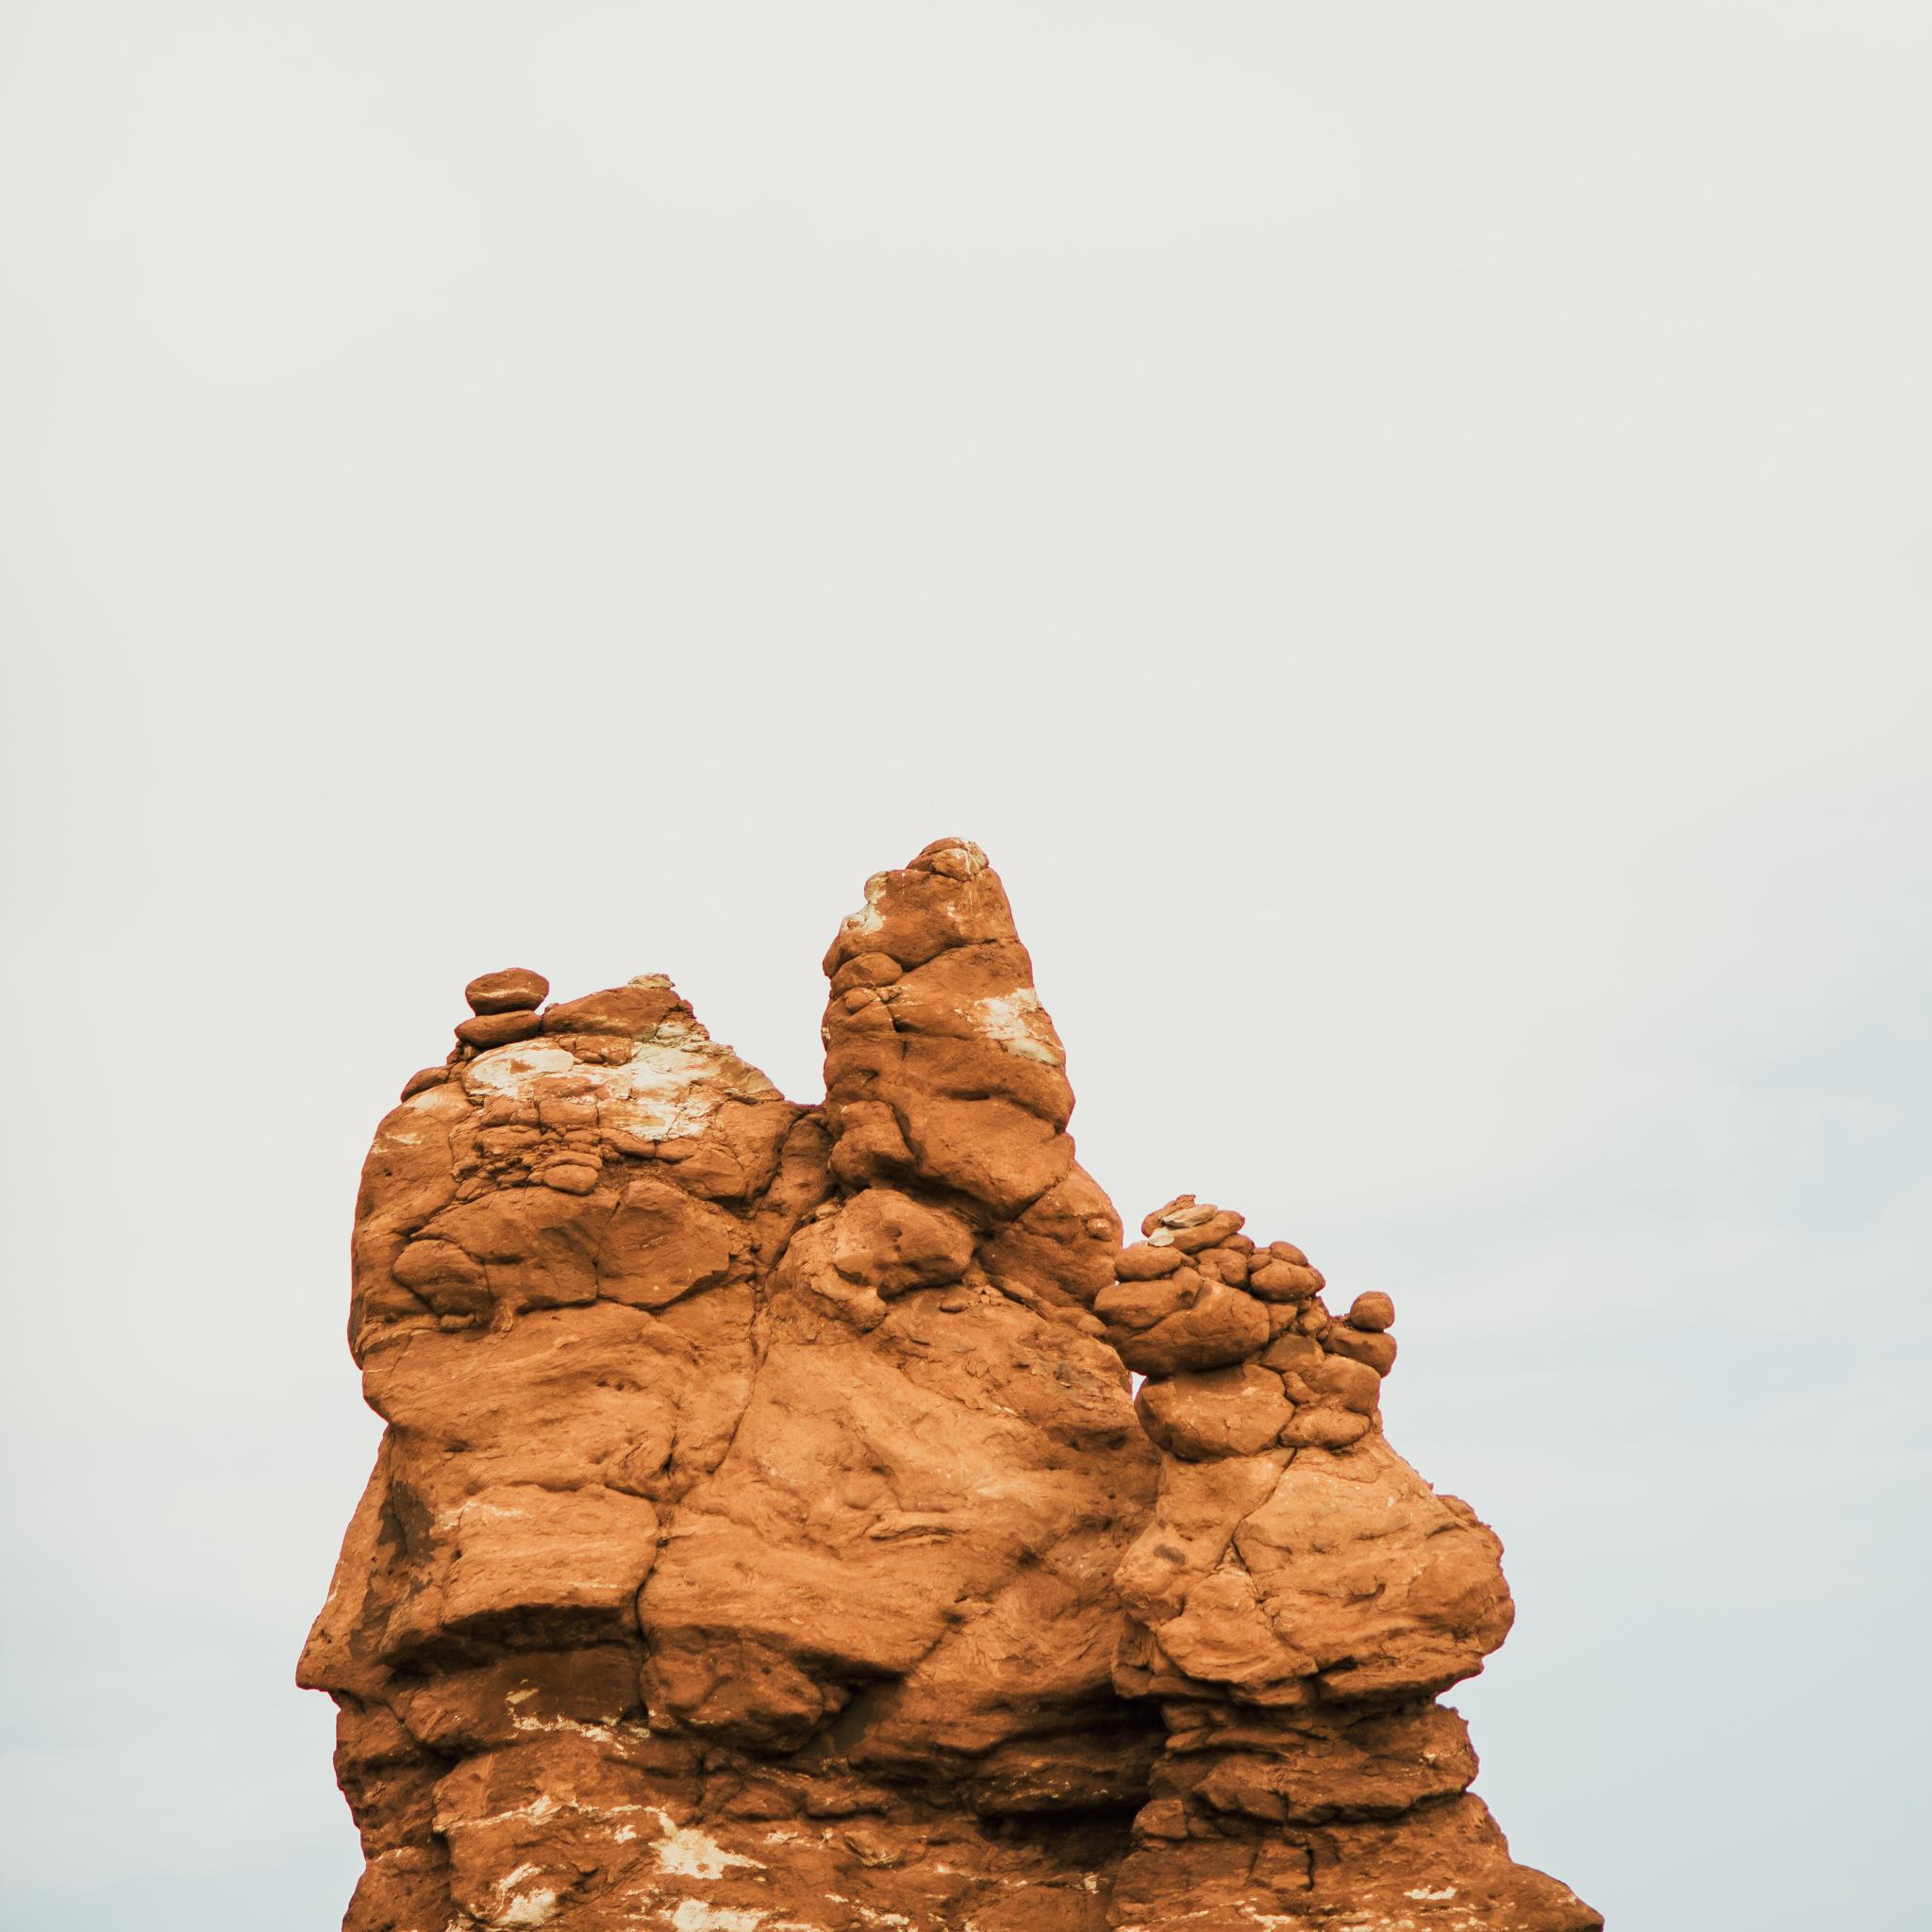 ©The-Ryans-Photography---Arches-National-Park-Moab-Utah-Travel-010.jpg